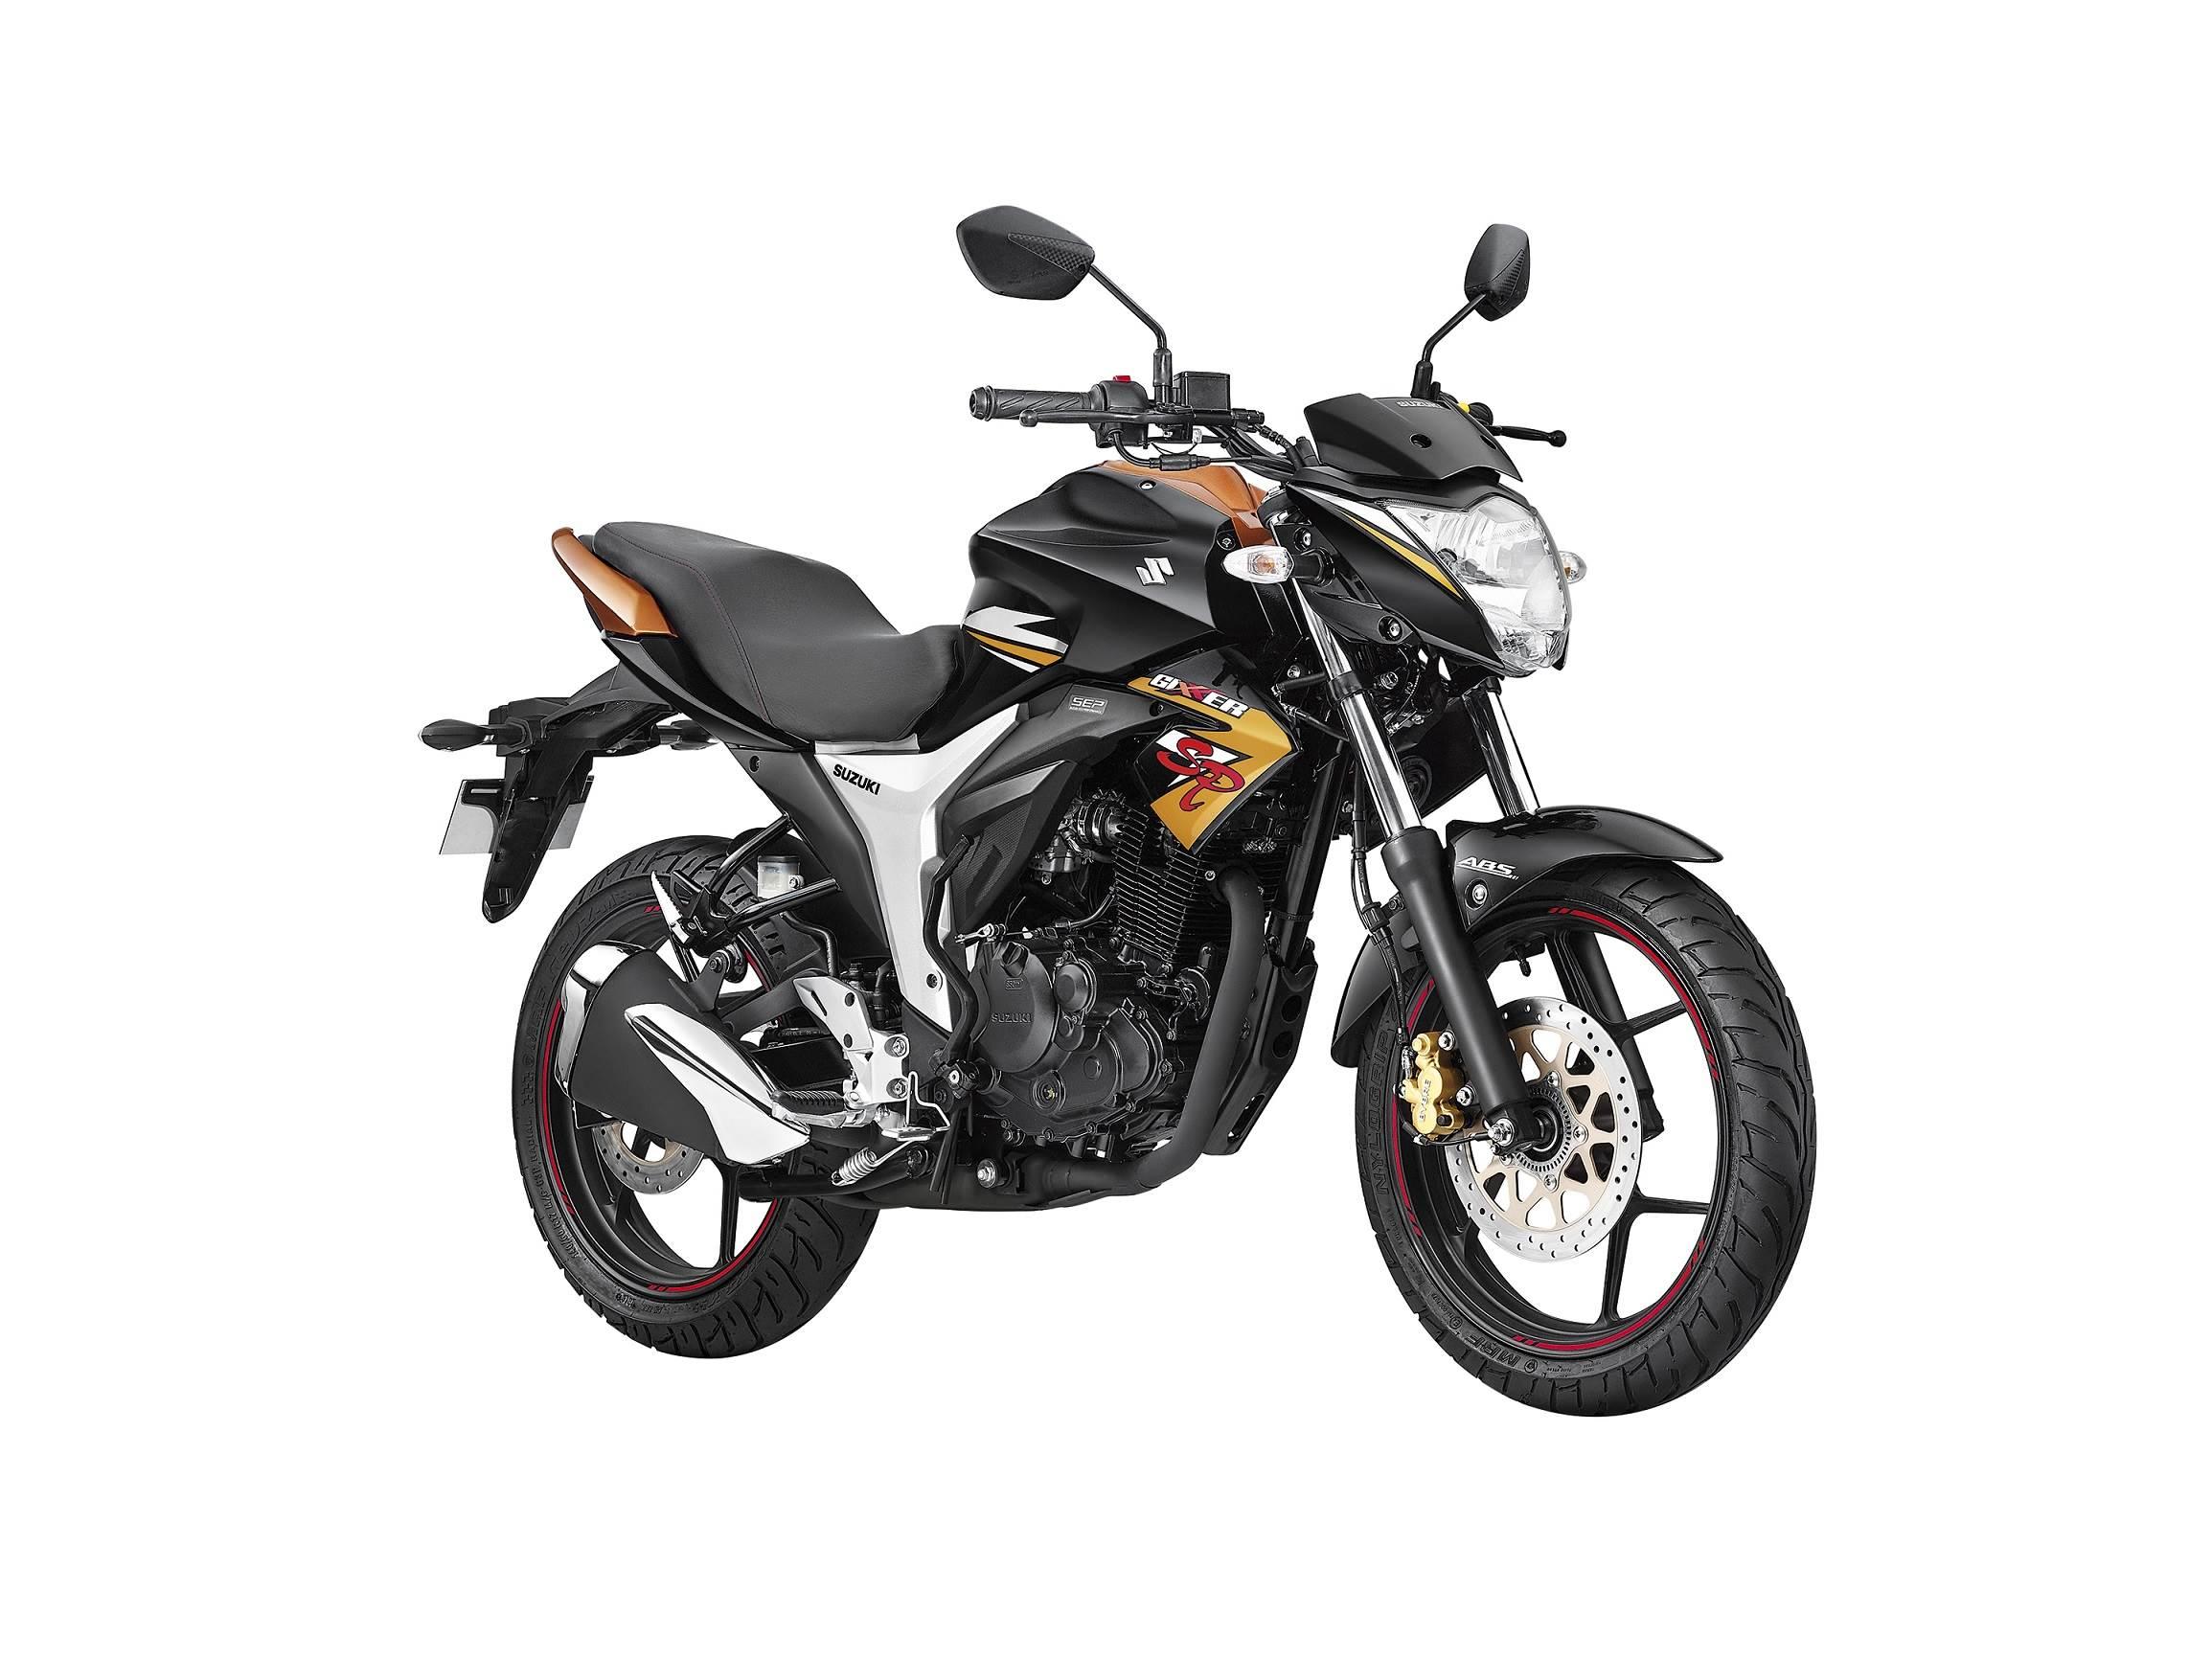 2018 Suzuki Gixxer SP and Gixxer SF SP launched